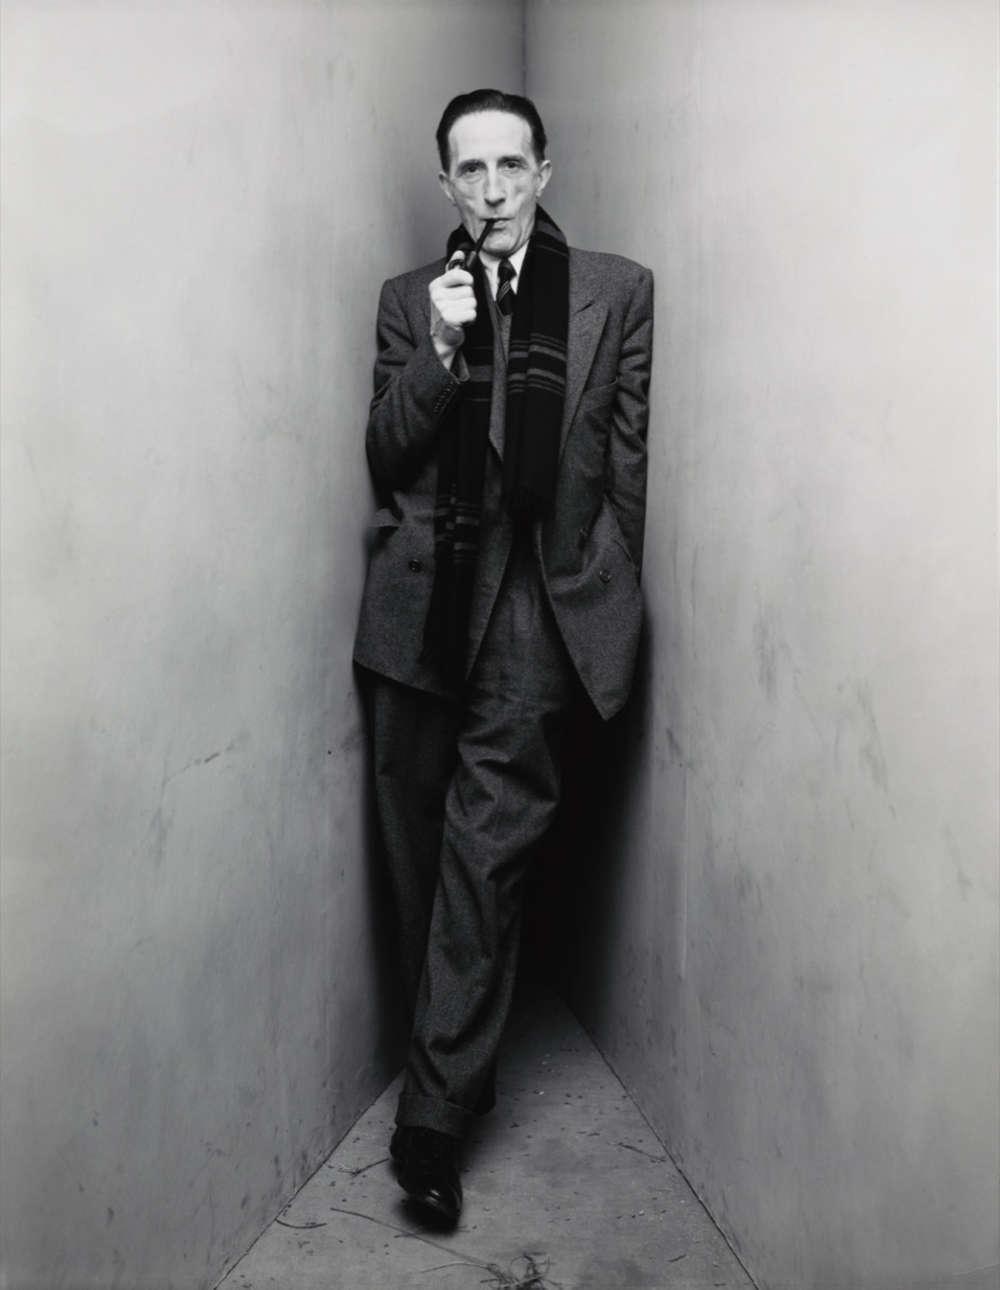 Irving Penn, Marcel Duchamp (1 of 2), New York, 1948. Gelatin silver print, made 1984. Image Dimensions: 24,4 x 19,4 cm (9,625 x 7,625 in) © The Irving Penn Foundation